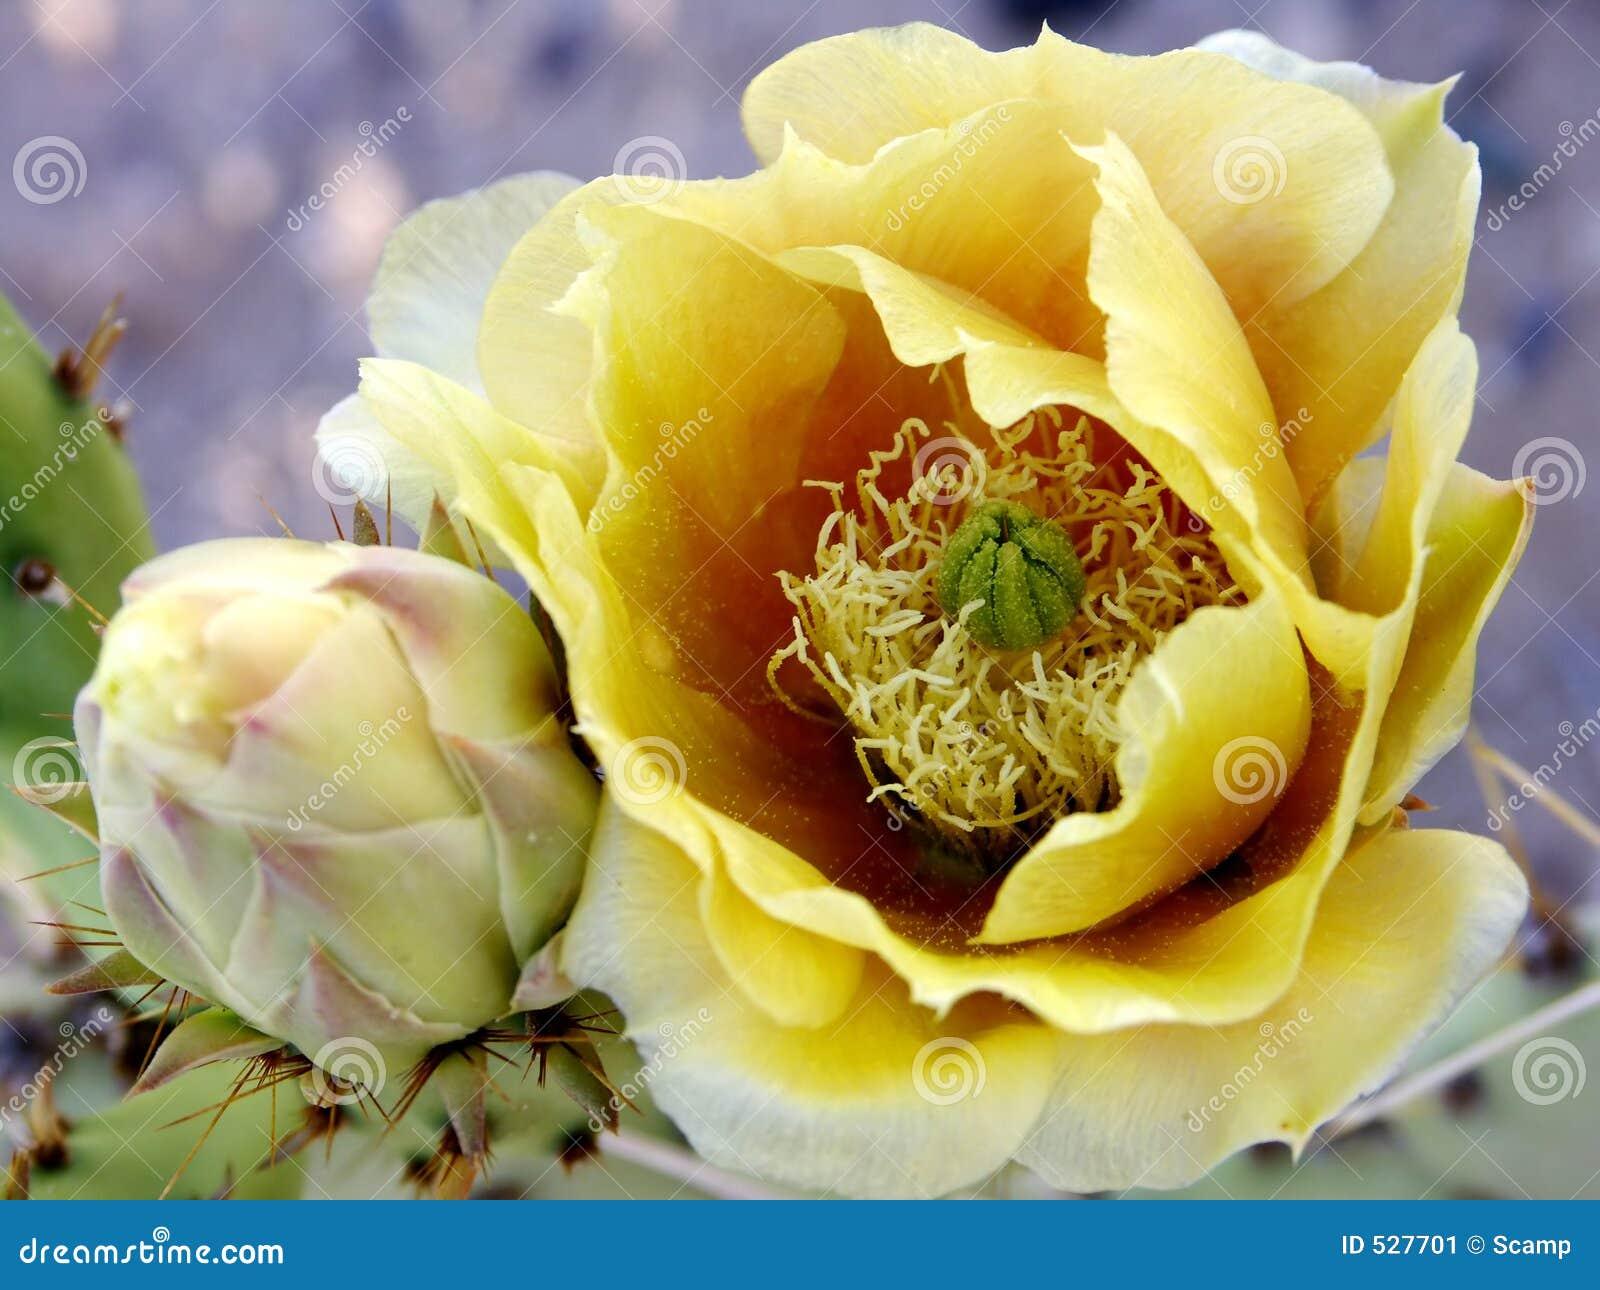 Download Beavertail仙人掌花 库存图片. 图片 包括有 仙人掌, 上升了, 黄色, 沙漠, budd, 绽放 - 527701